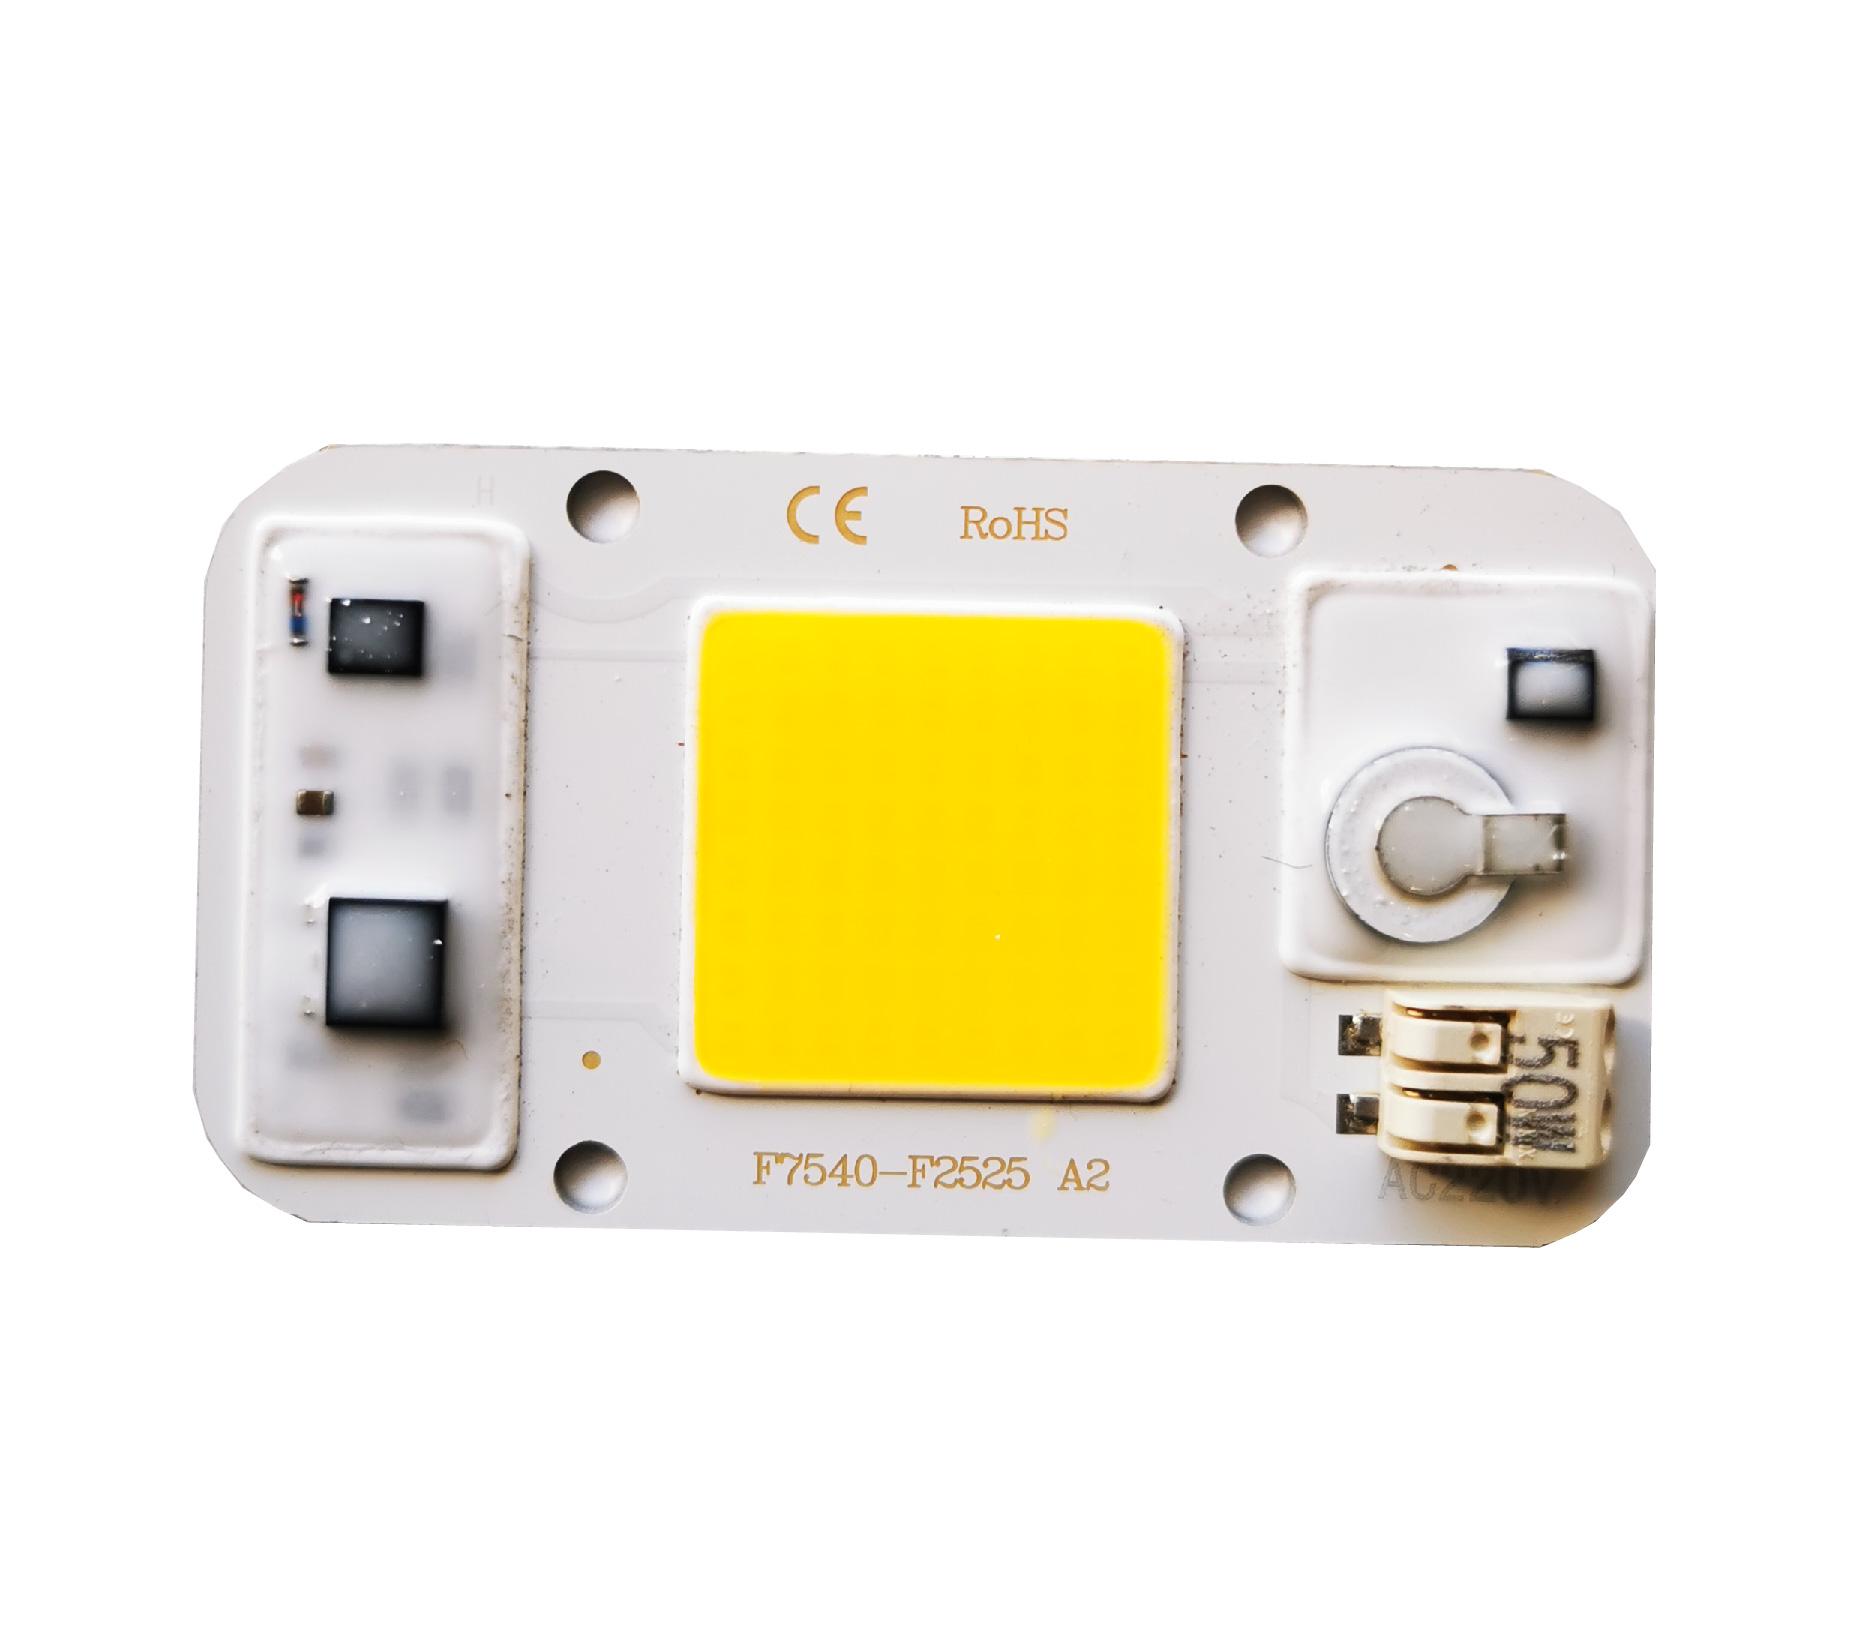 50W LED COB Chip Solderless (Warm White)